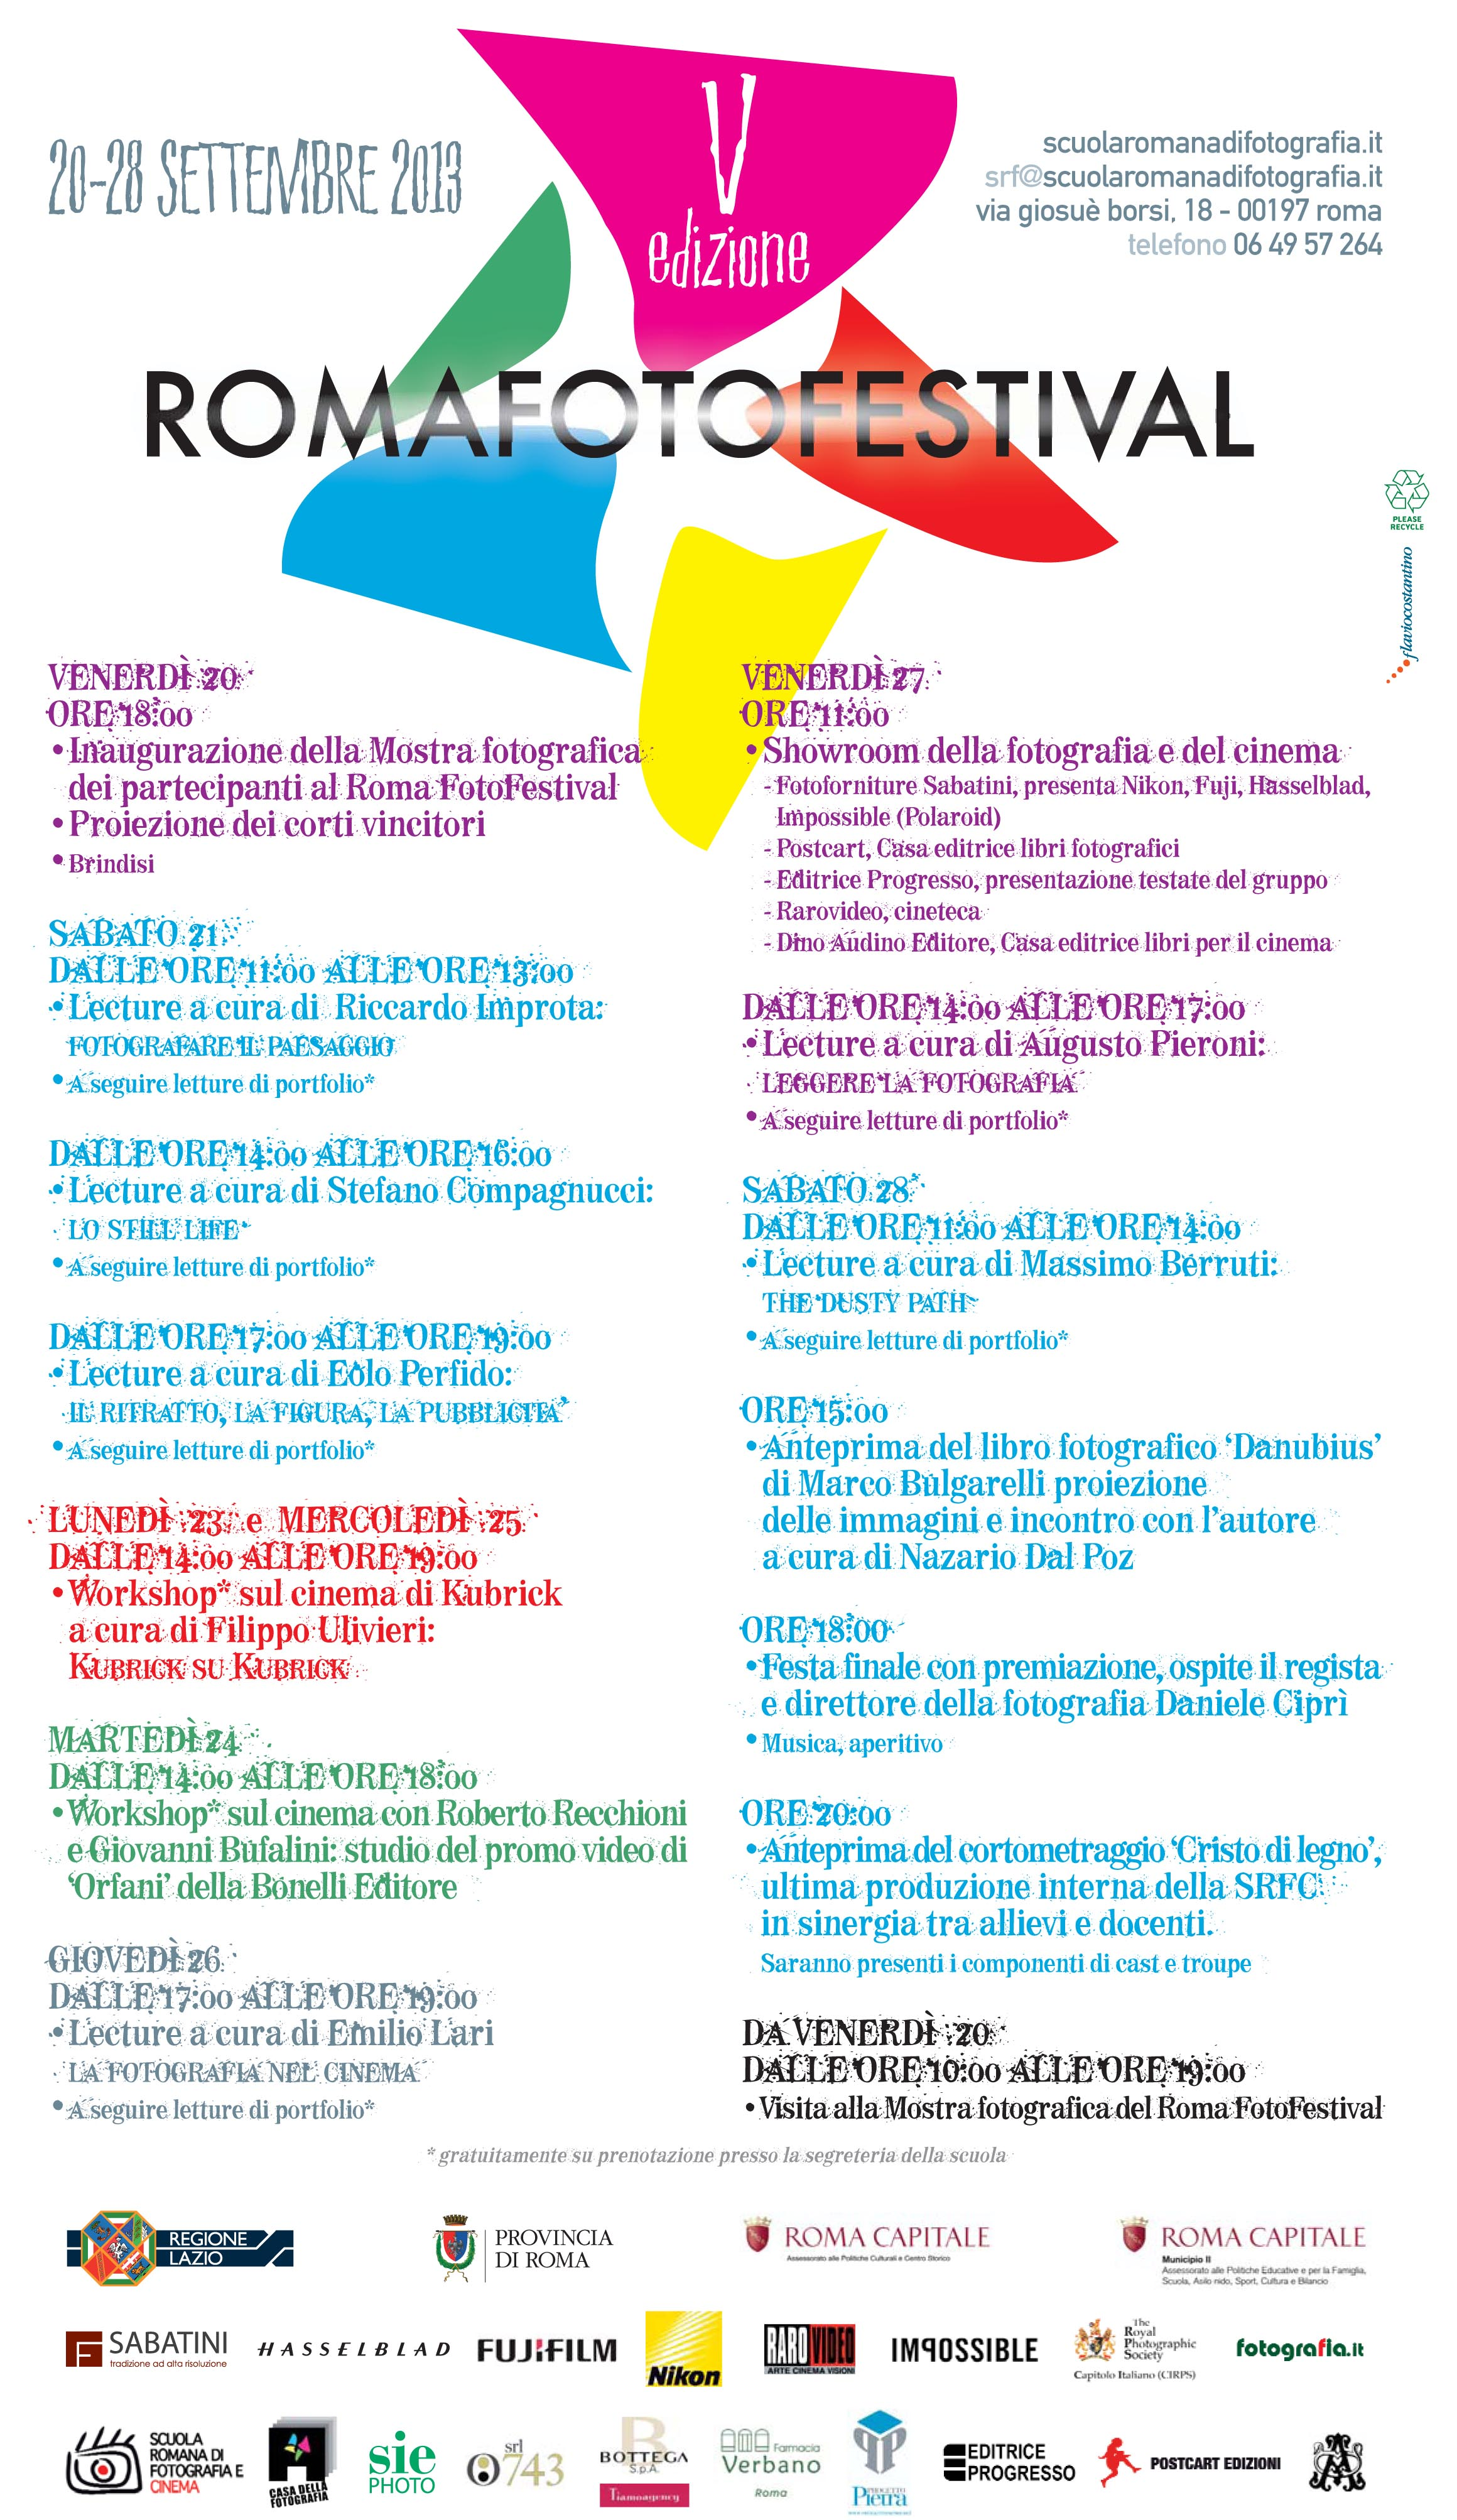 RomaFotoFestival_programma_SRFC